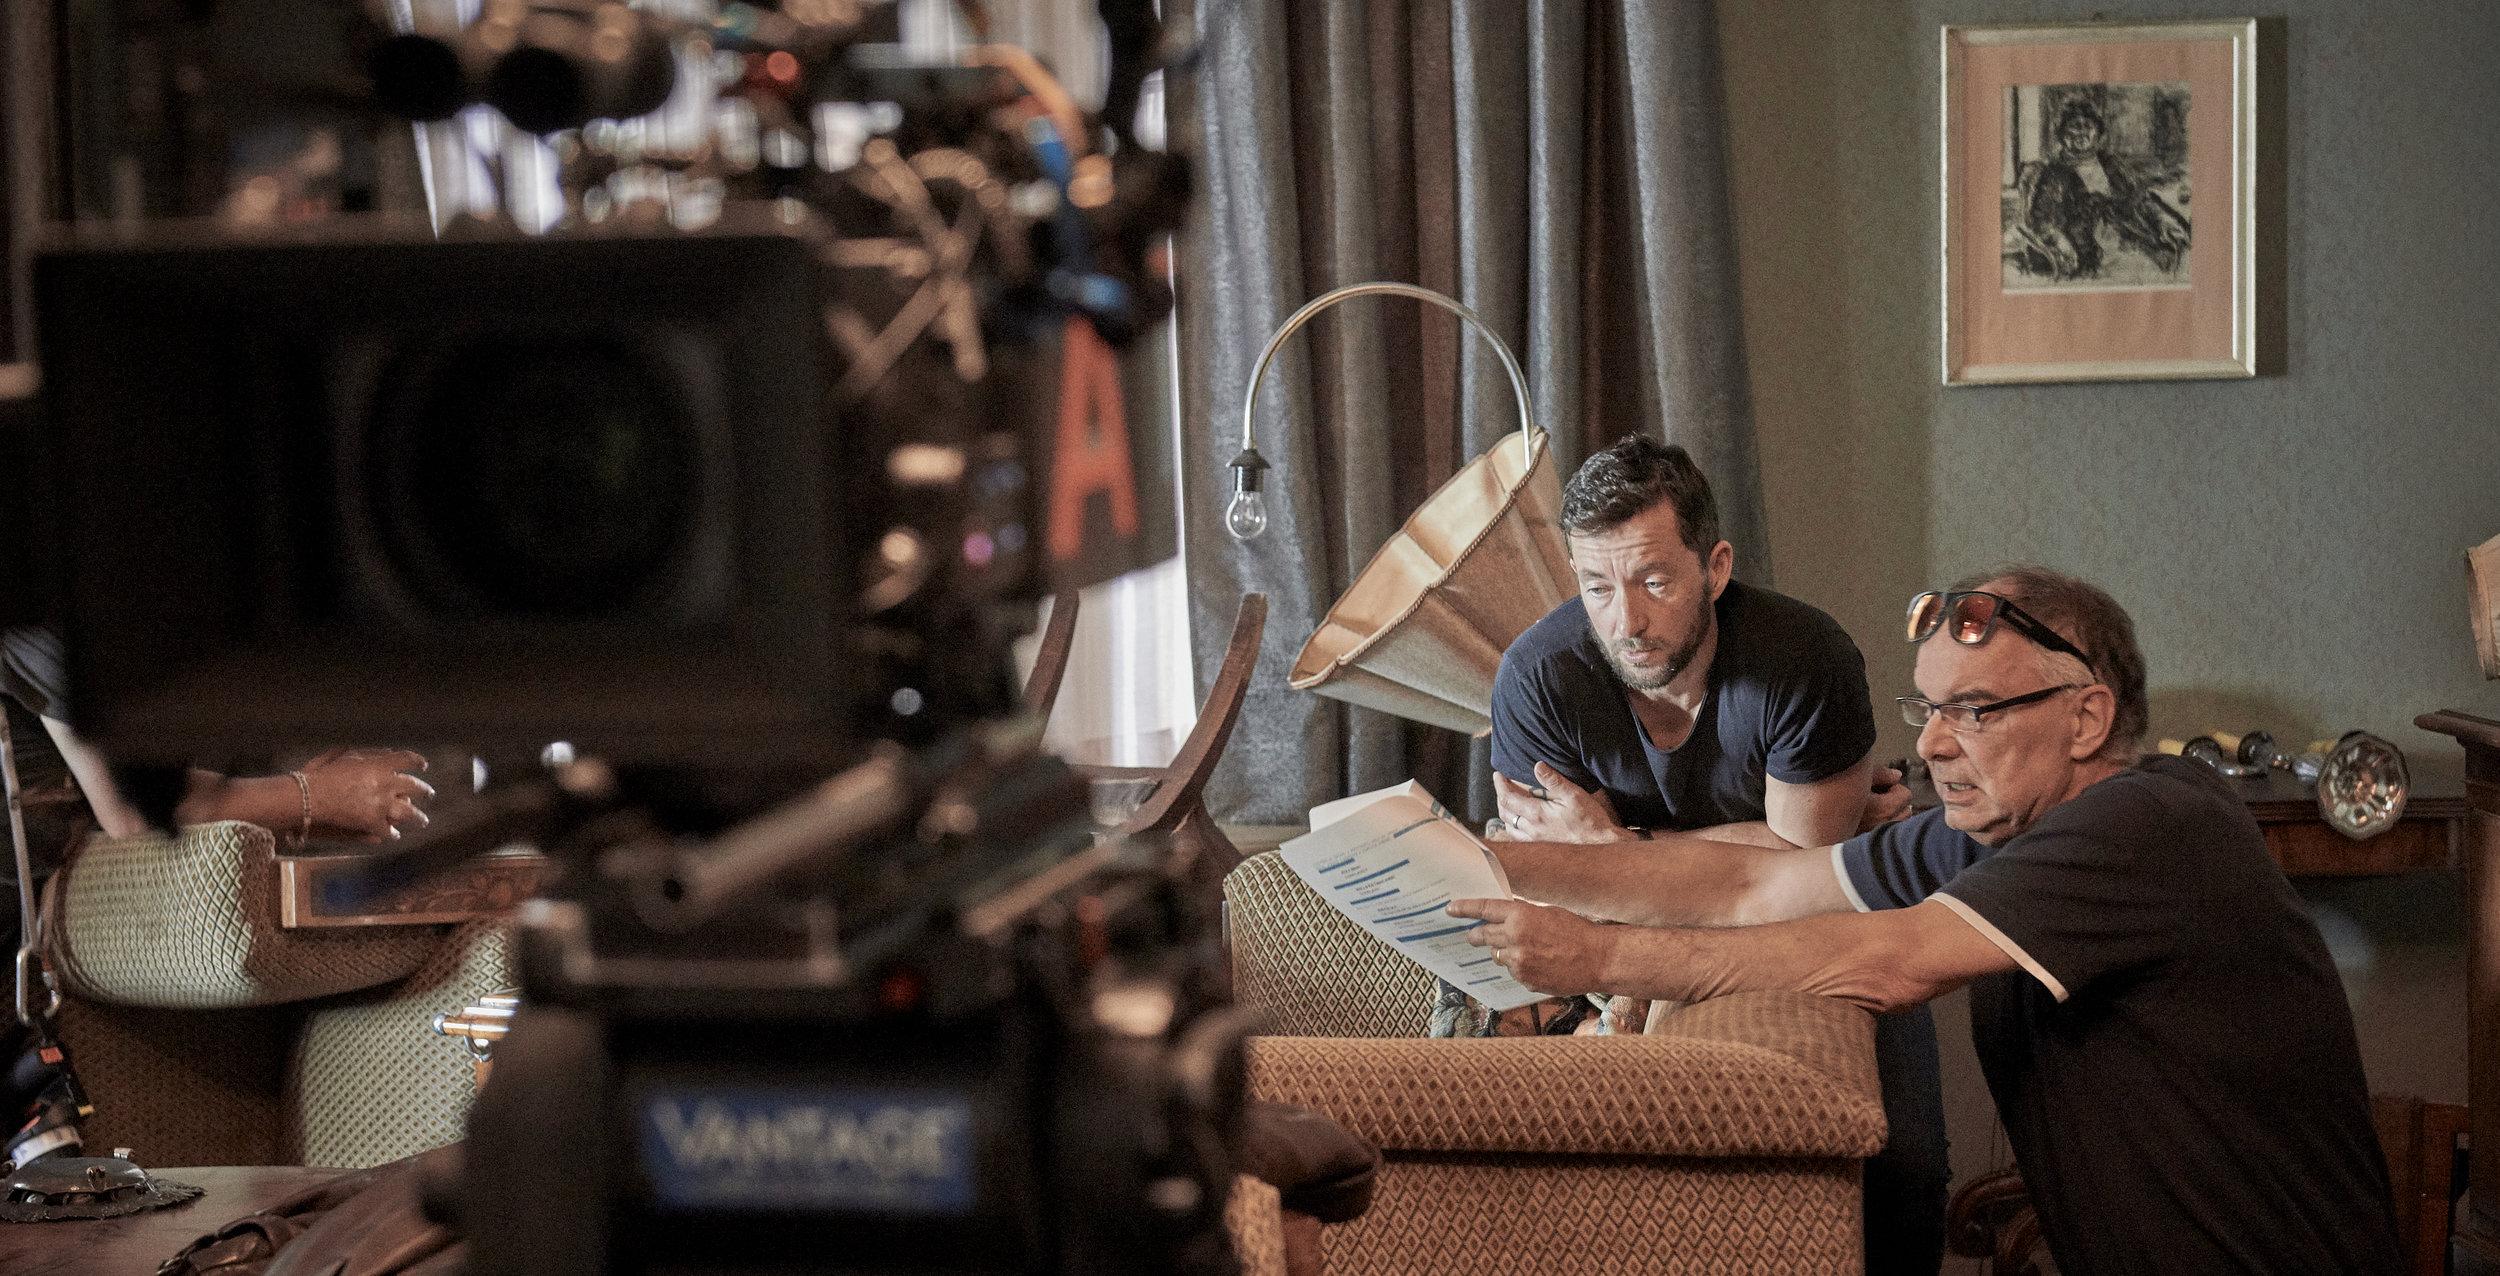 kameraman Tomáš Sysel a režisér Ondřej Trojan FOTO Martin Špelda.jpg